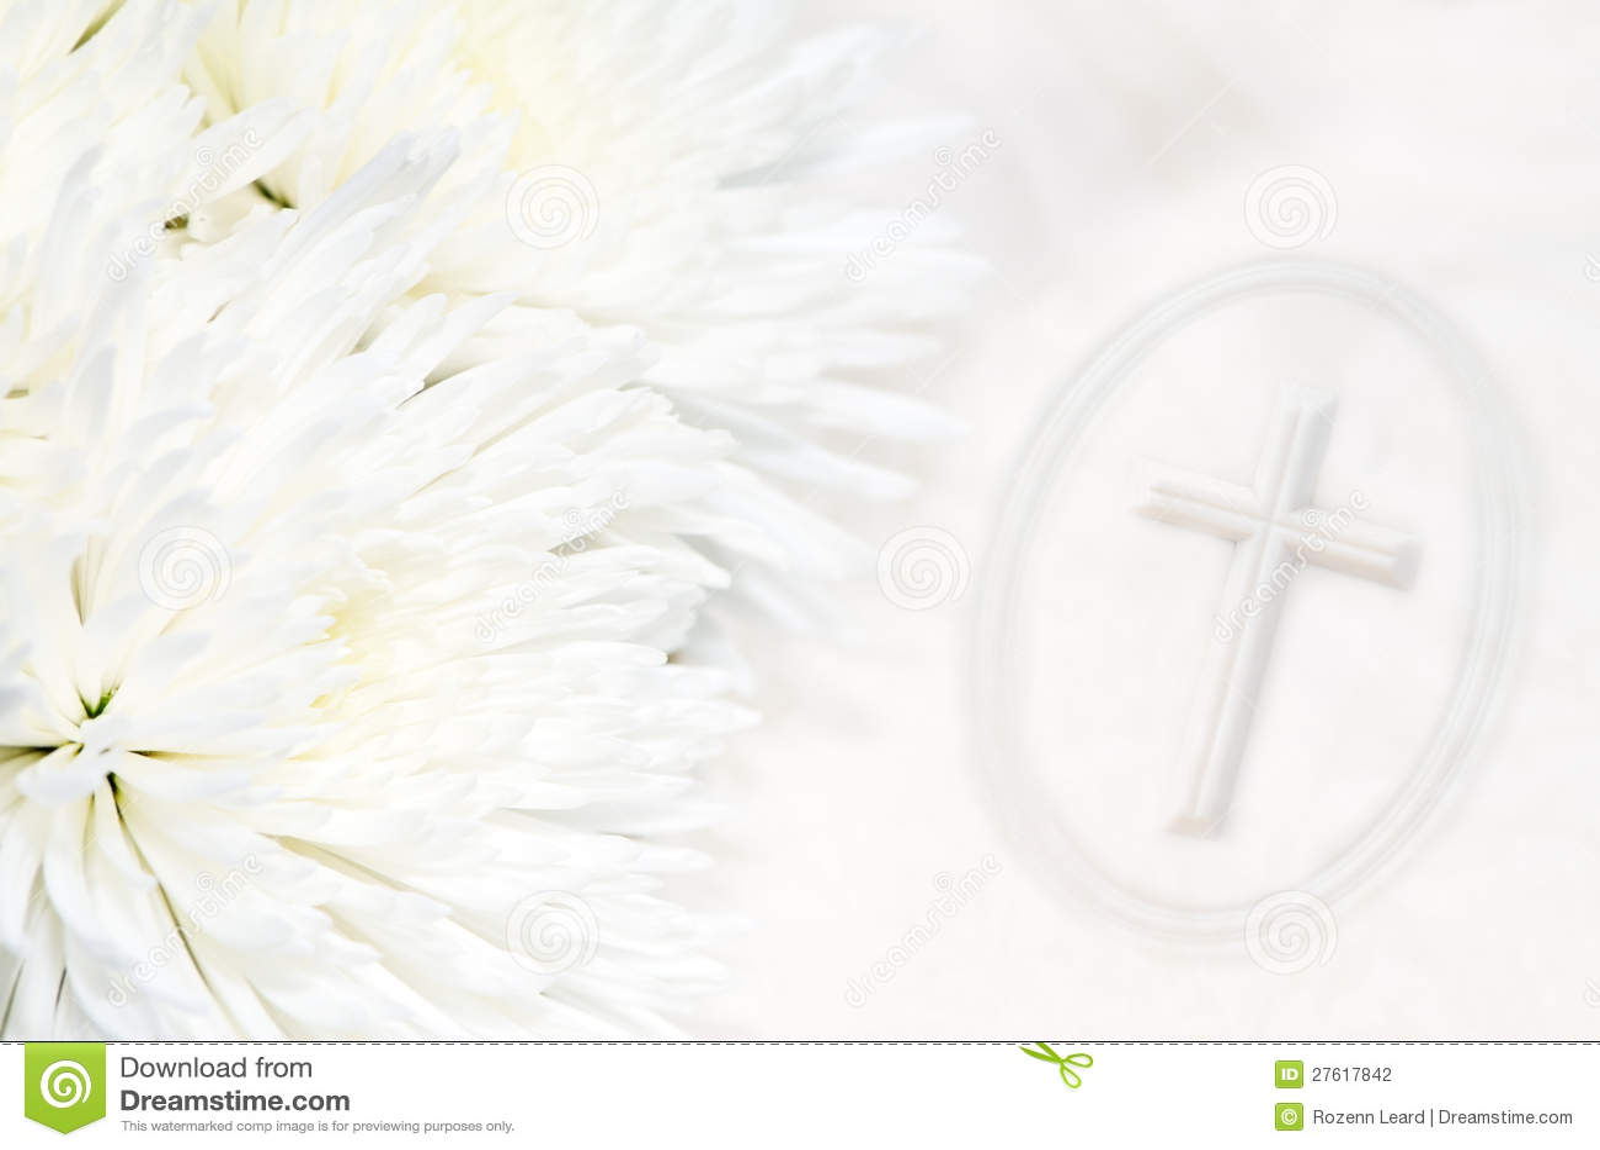 Christening Invitation Message for perfect invitations ideas